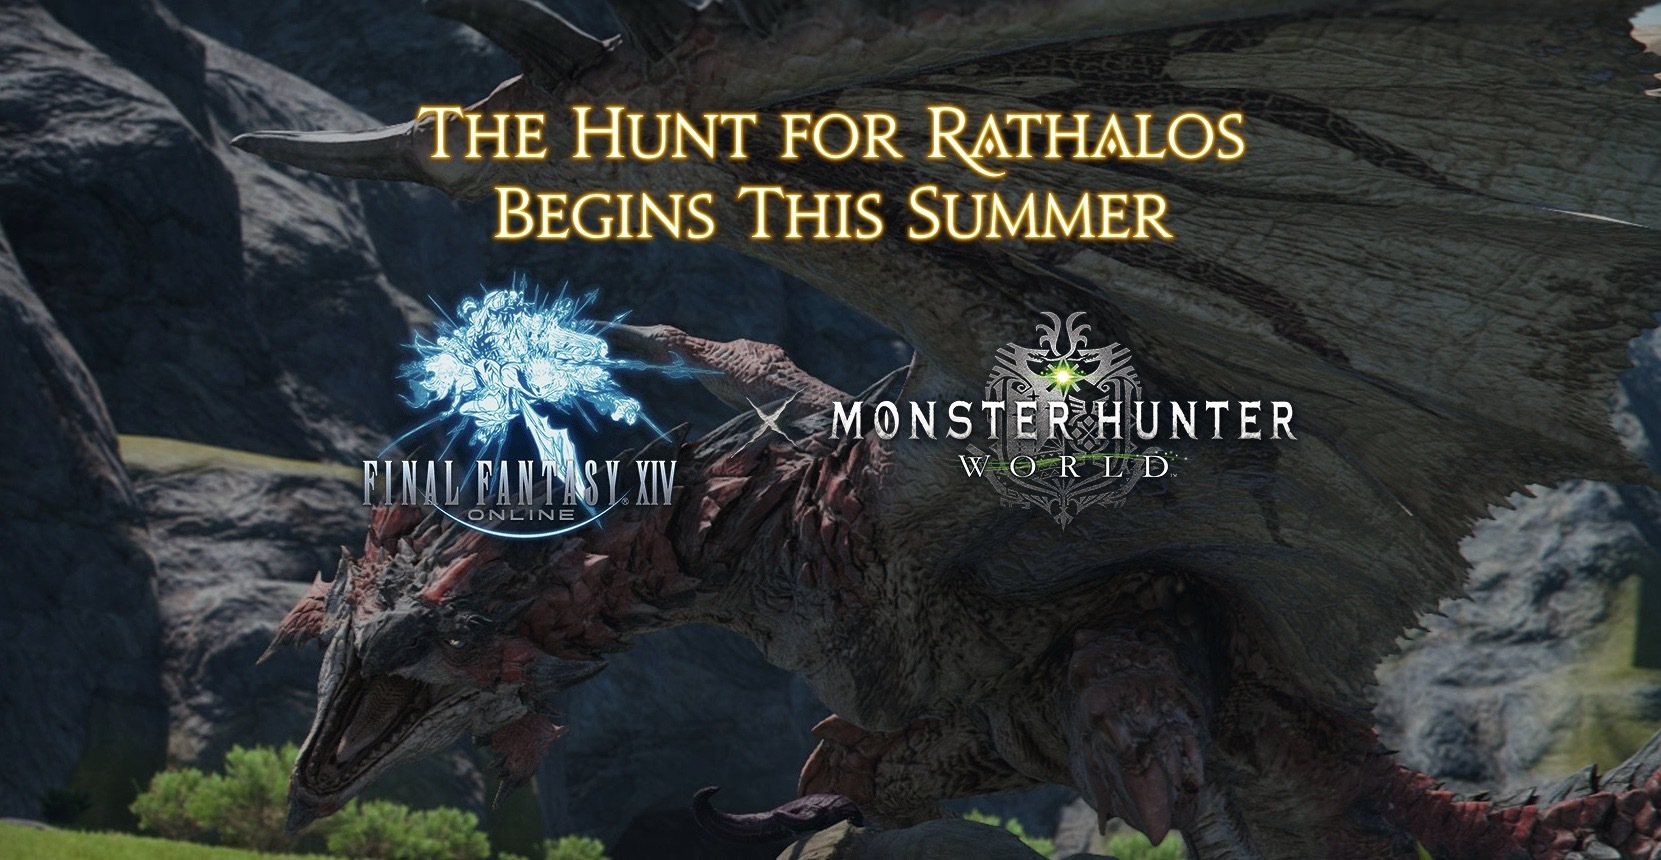 Final Fantasy XIV Online - Monster Hunter World - Rathalos